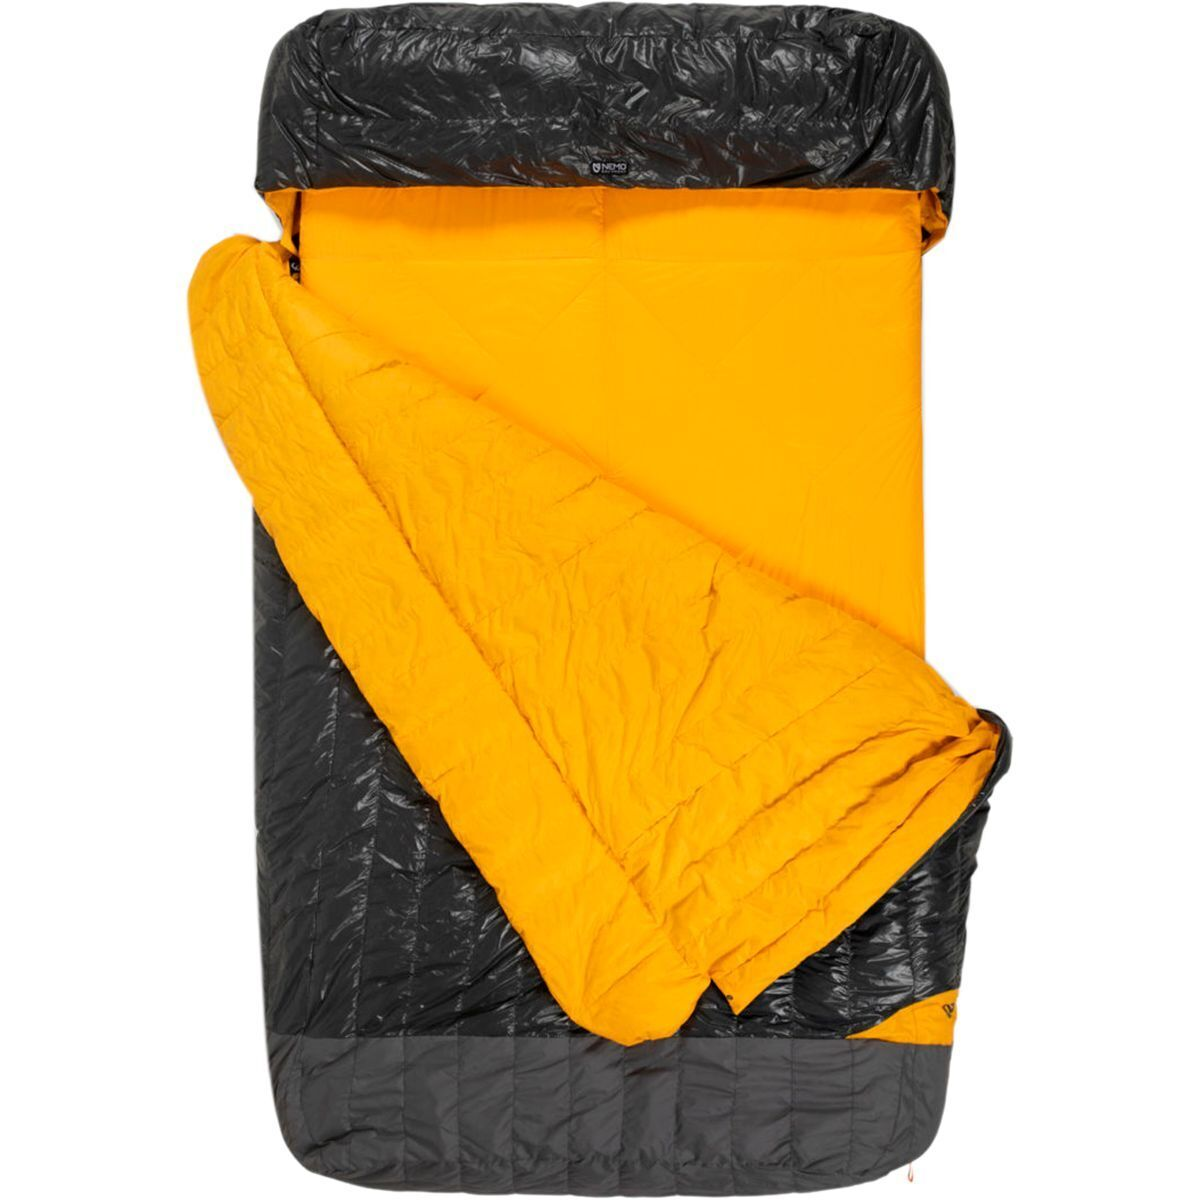 NEMO Equipment Inc. Tango Solo Sleeping Bag: 30 Degree Down One Color, One Size